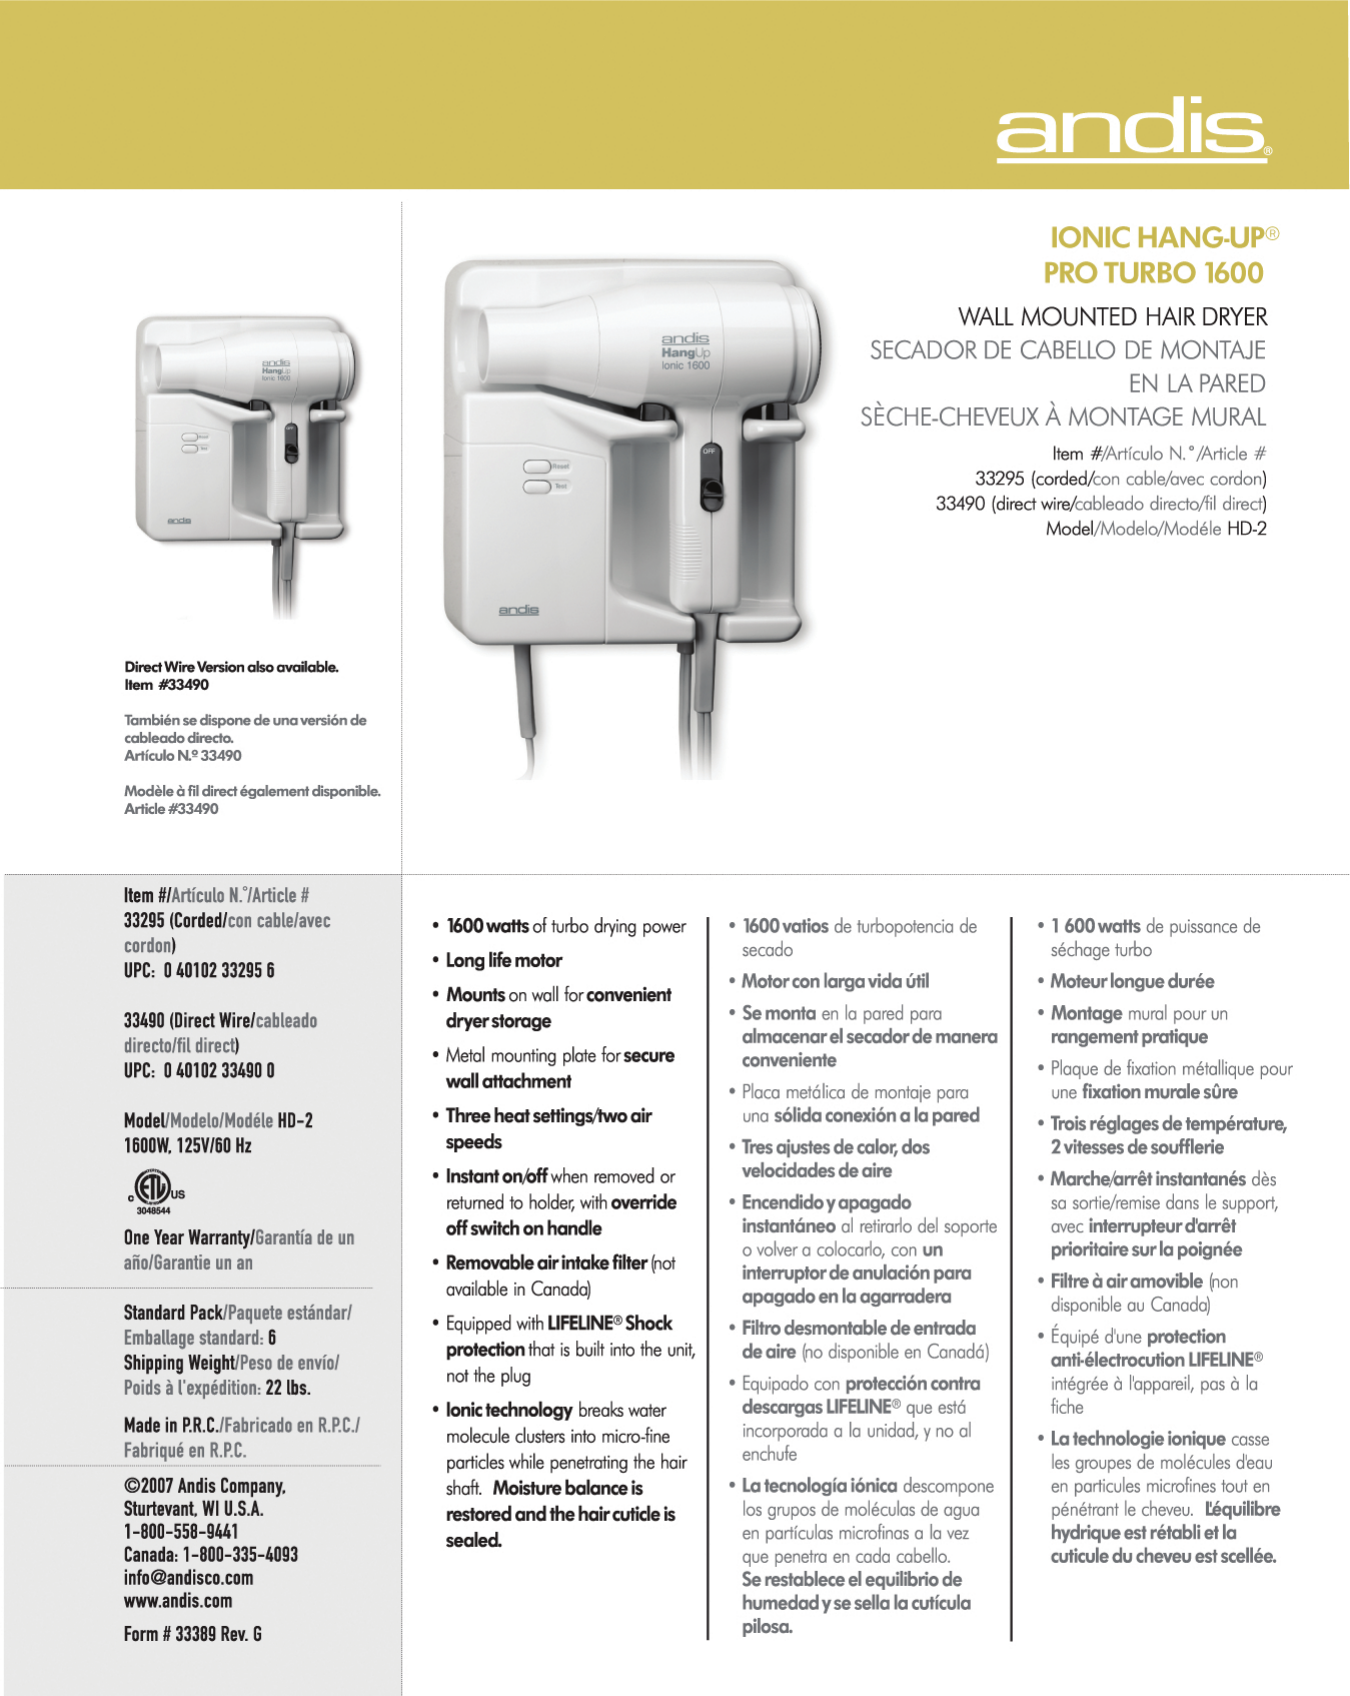 Rangement Pour Seche Cheveux andis company hd 2 users manual adobe photoshop pdf